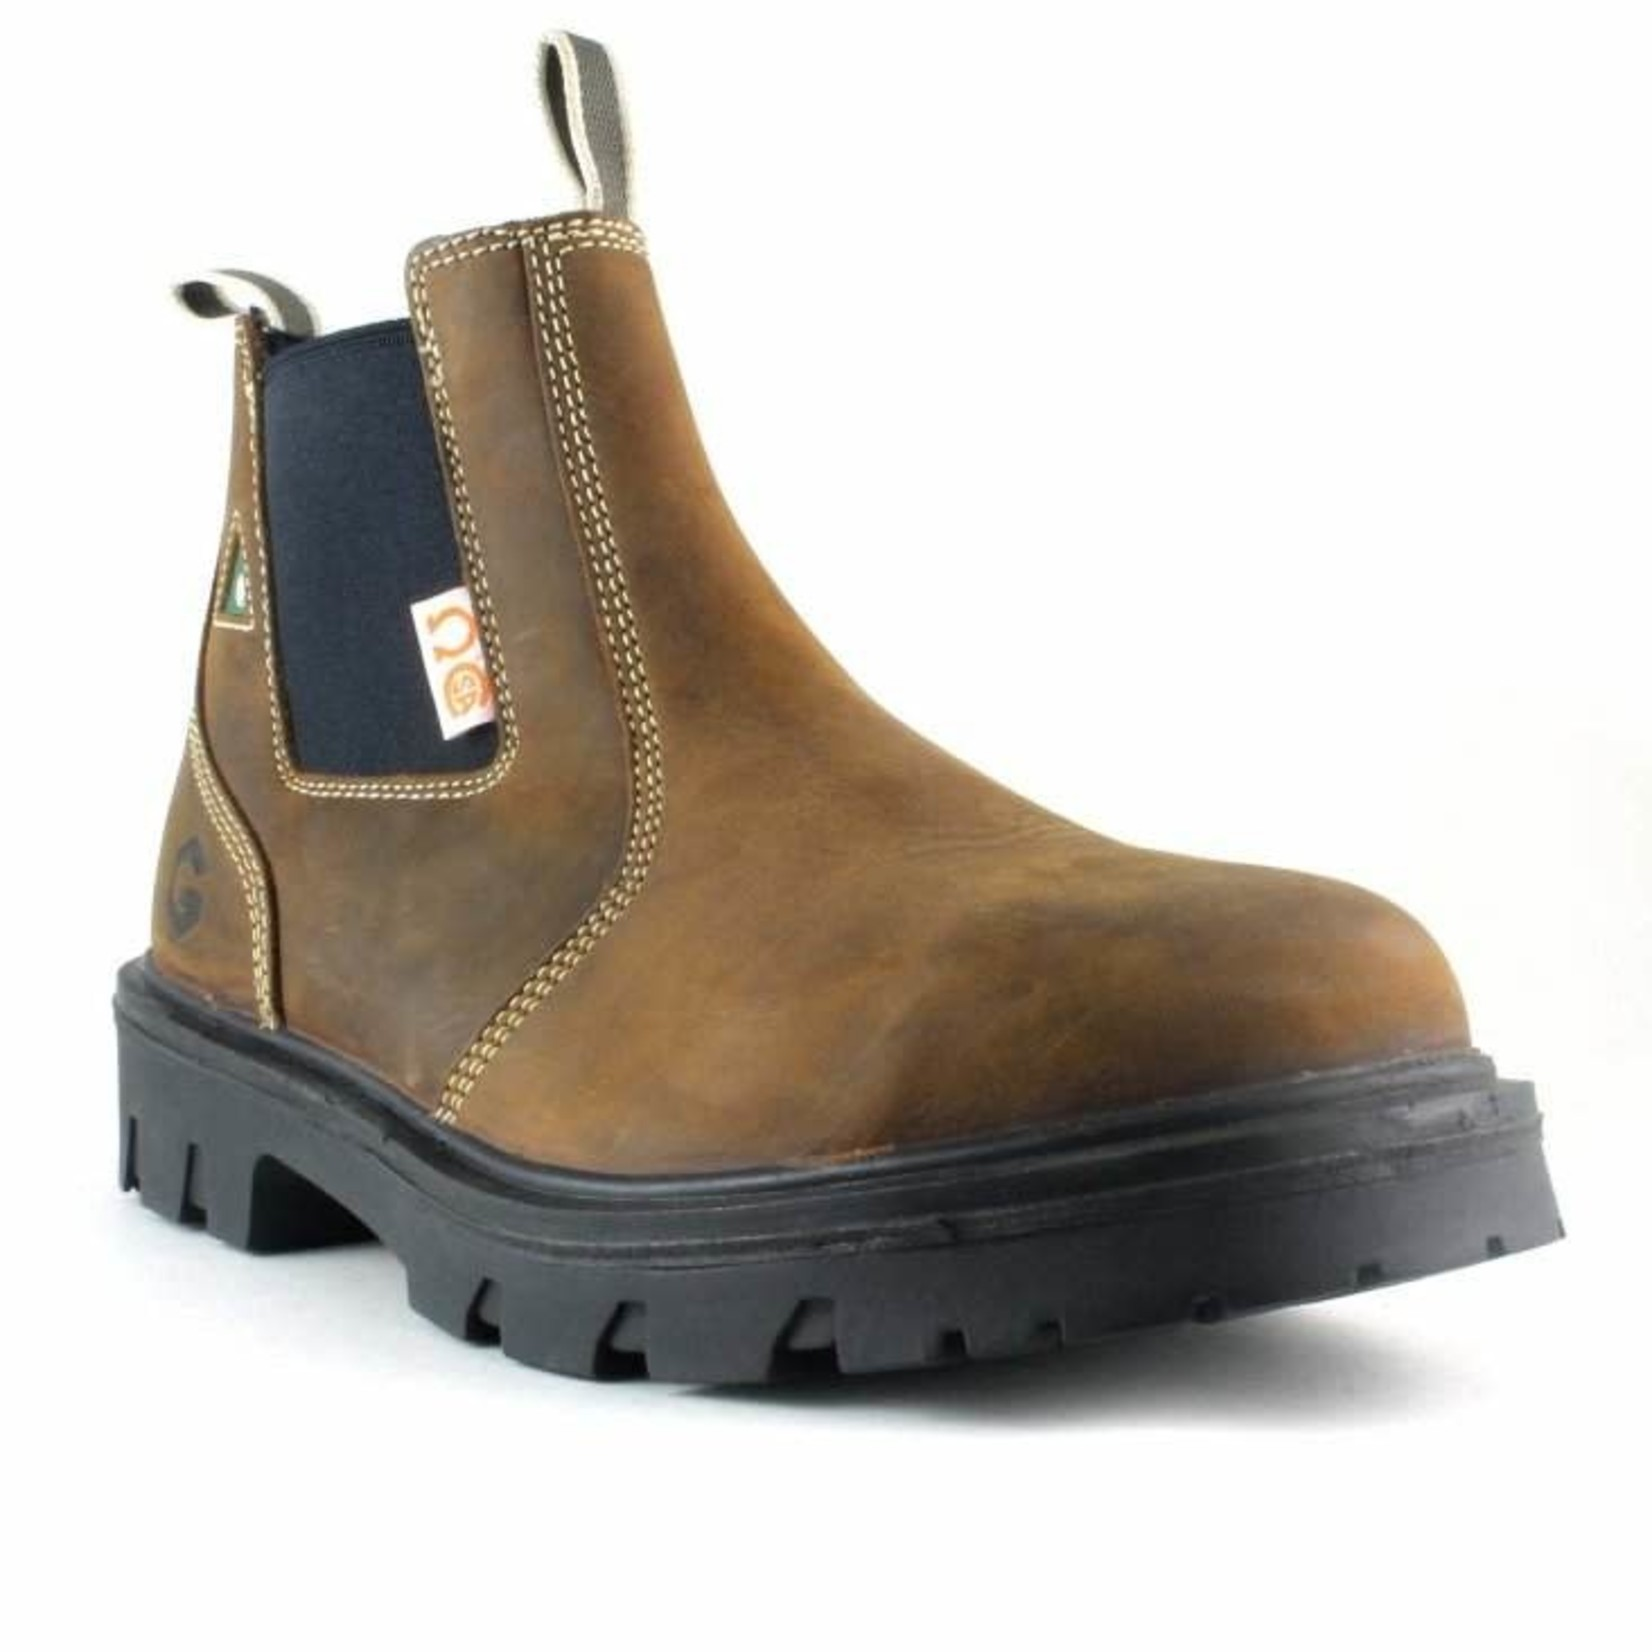 JB Goohue J.B. Goodhue Men's Defender #40200 Slip On CSA Boot